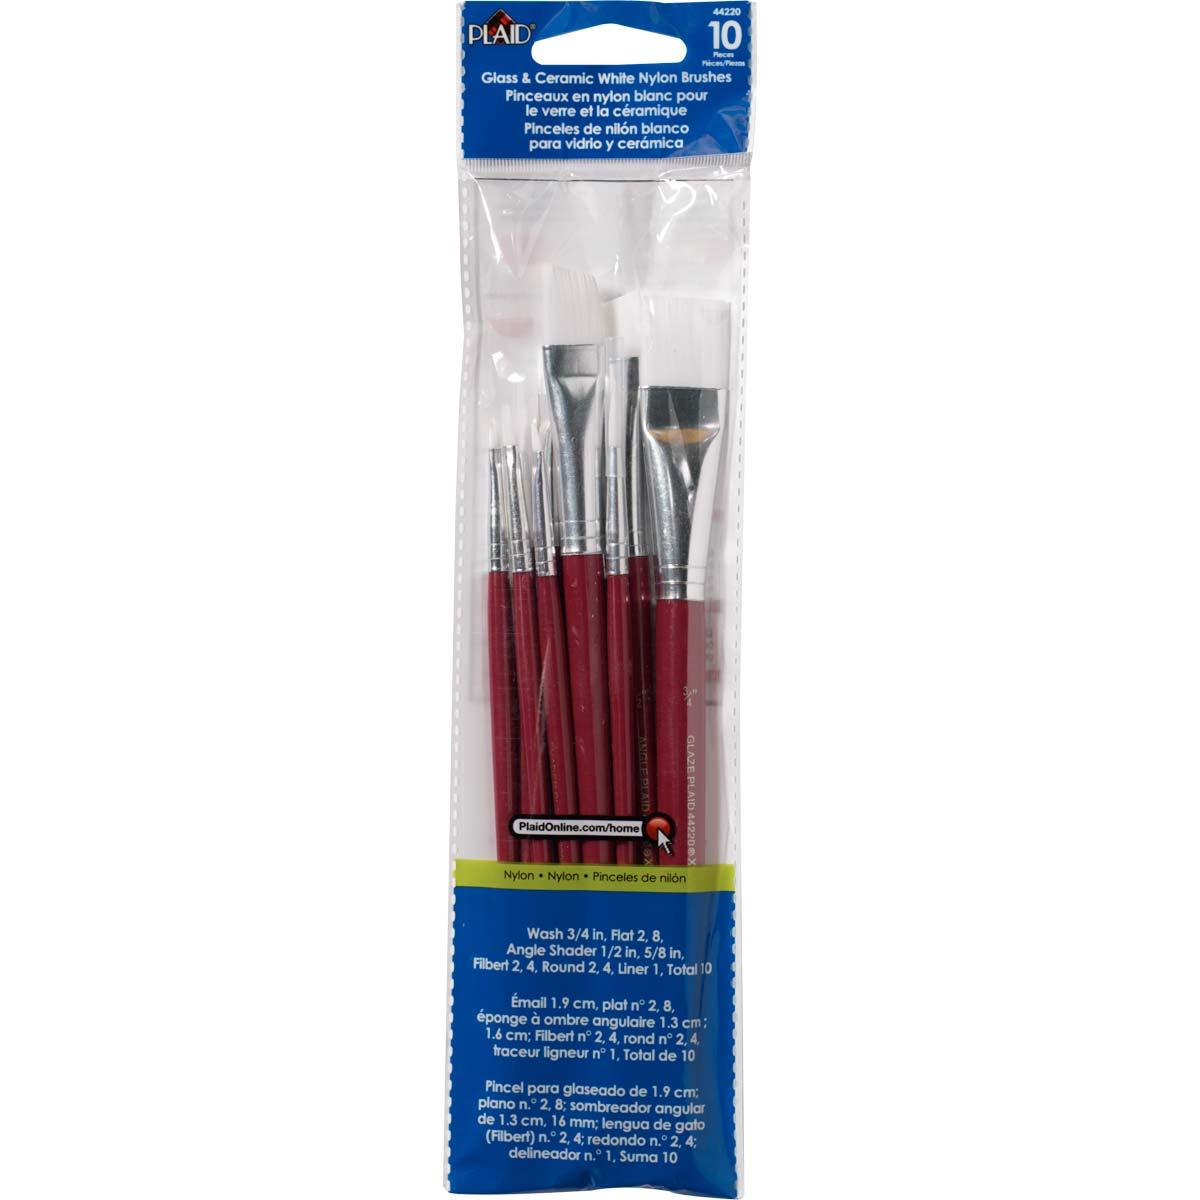 Plaid ® Brush Sets - Basic Brush Set, White Nylon